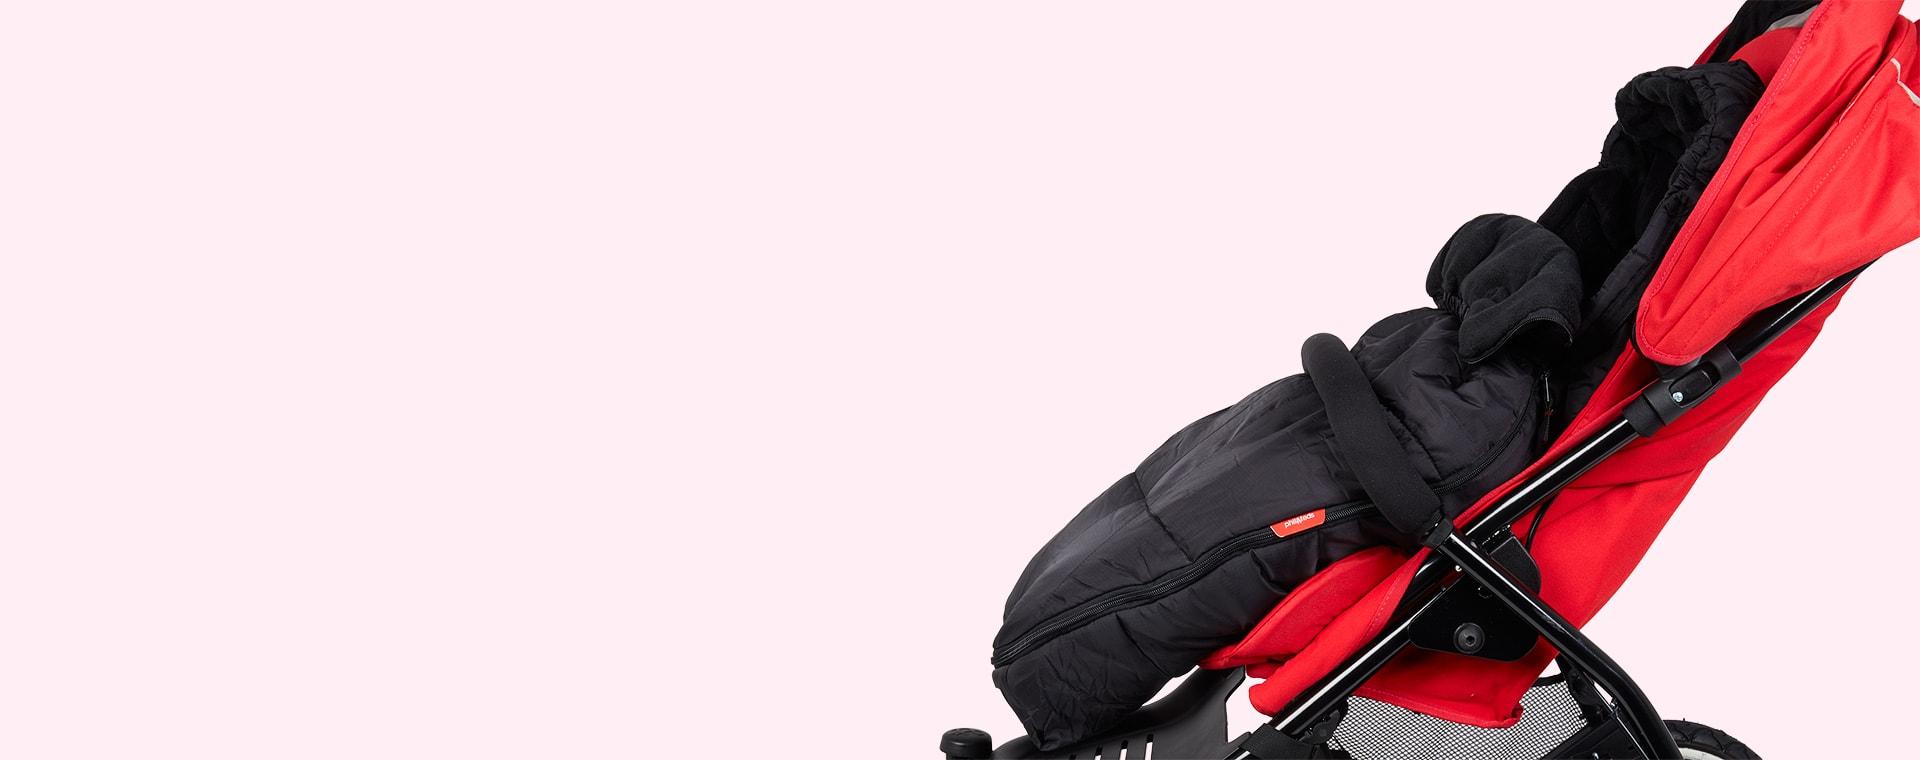 Black phil&teds Snuggle and Snooze sleeping bag